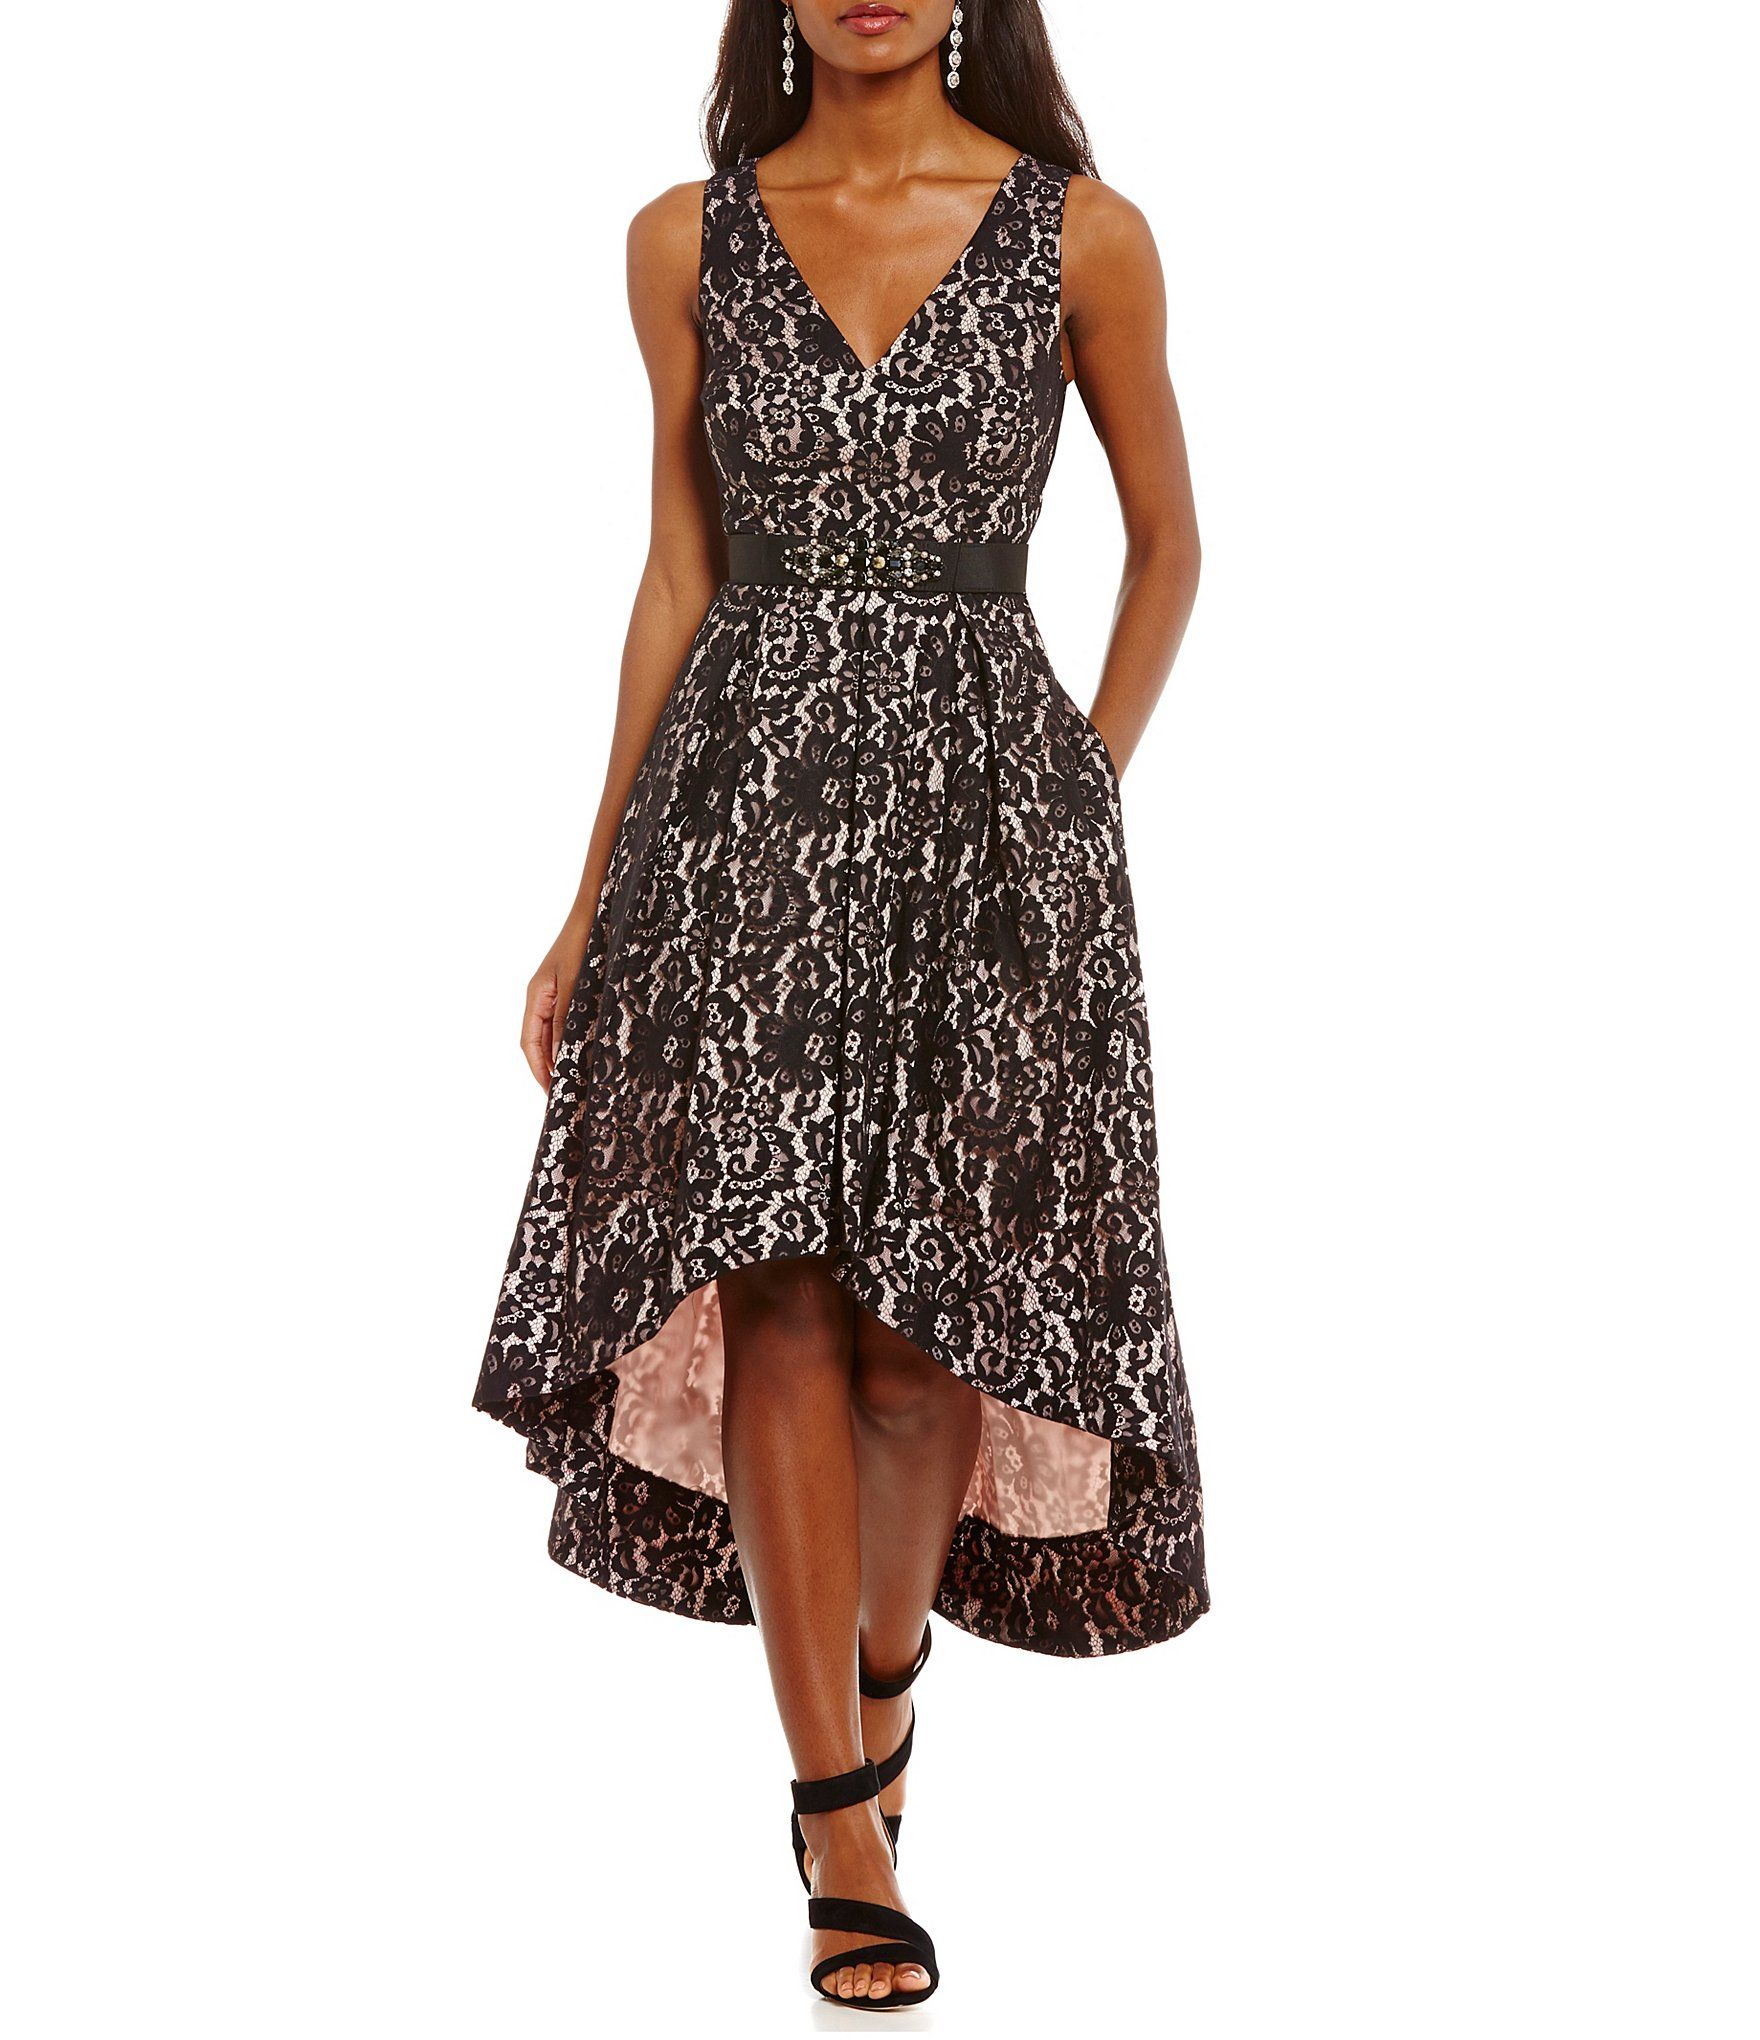 b92290970e6 Shop for Eliza J V-Neck Lace High Low Dress at Dillards.com. Visit Dillards.com  to find clothing